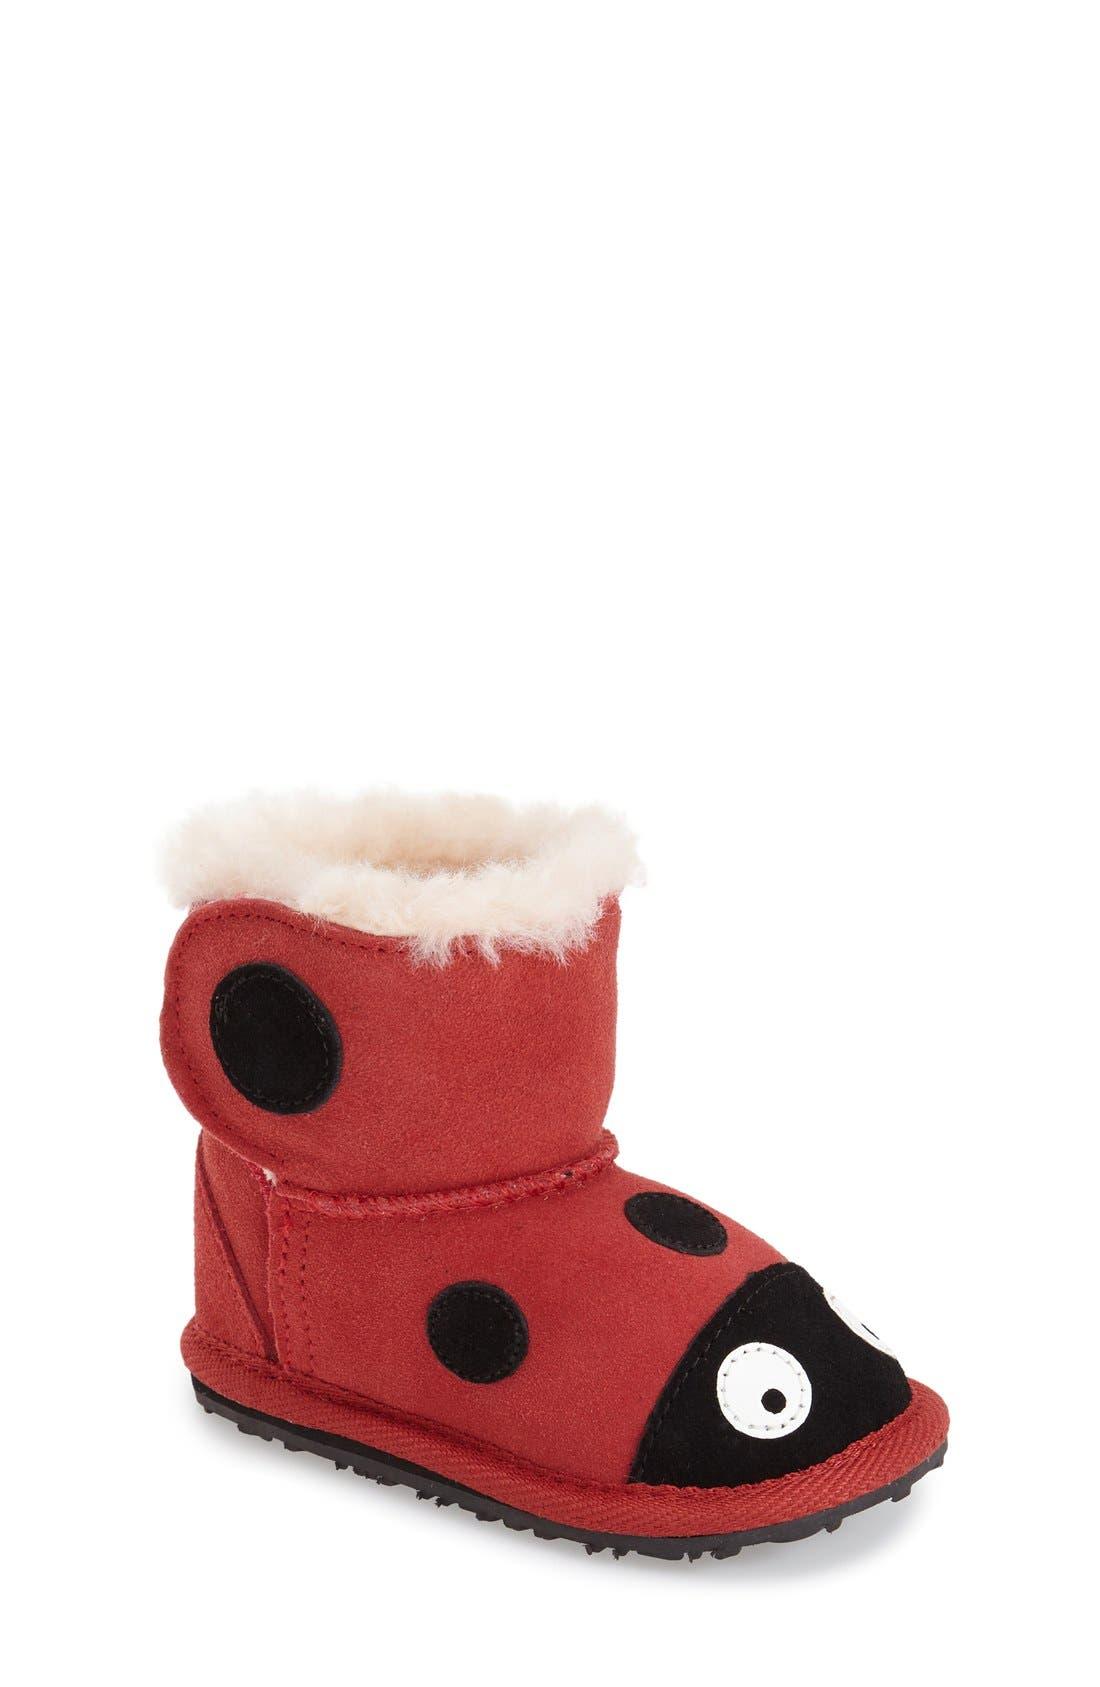 Alternate Image 1 Selected - EMU Australia 'Ladybug' Boot (Baby & Walker)